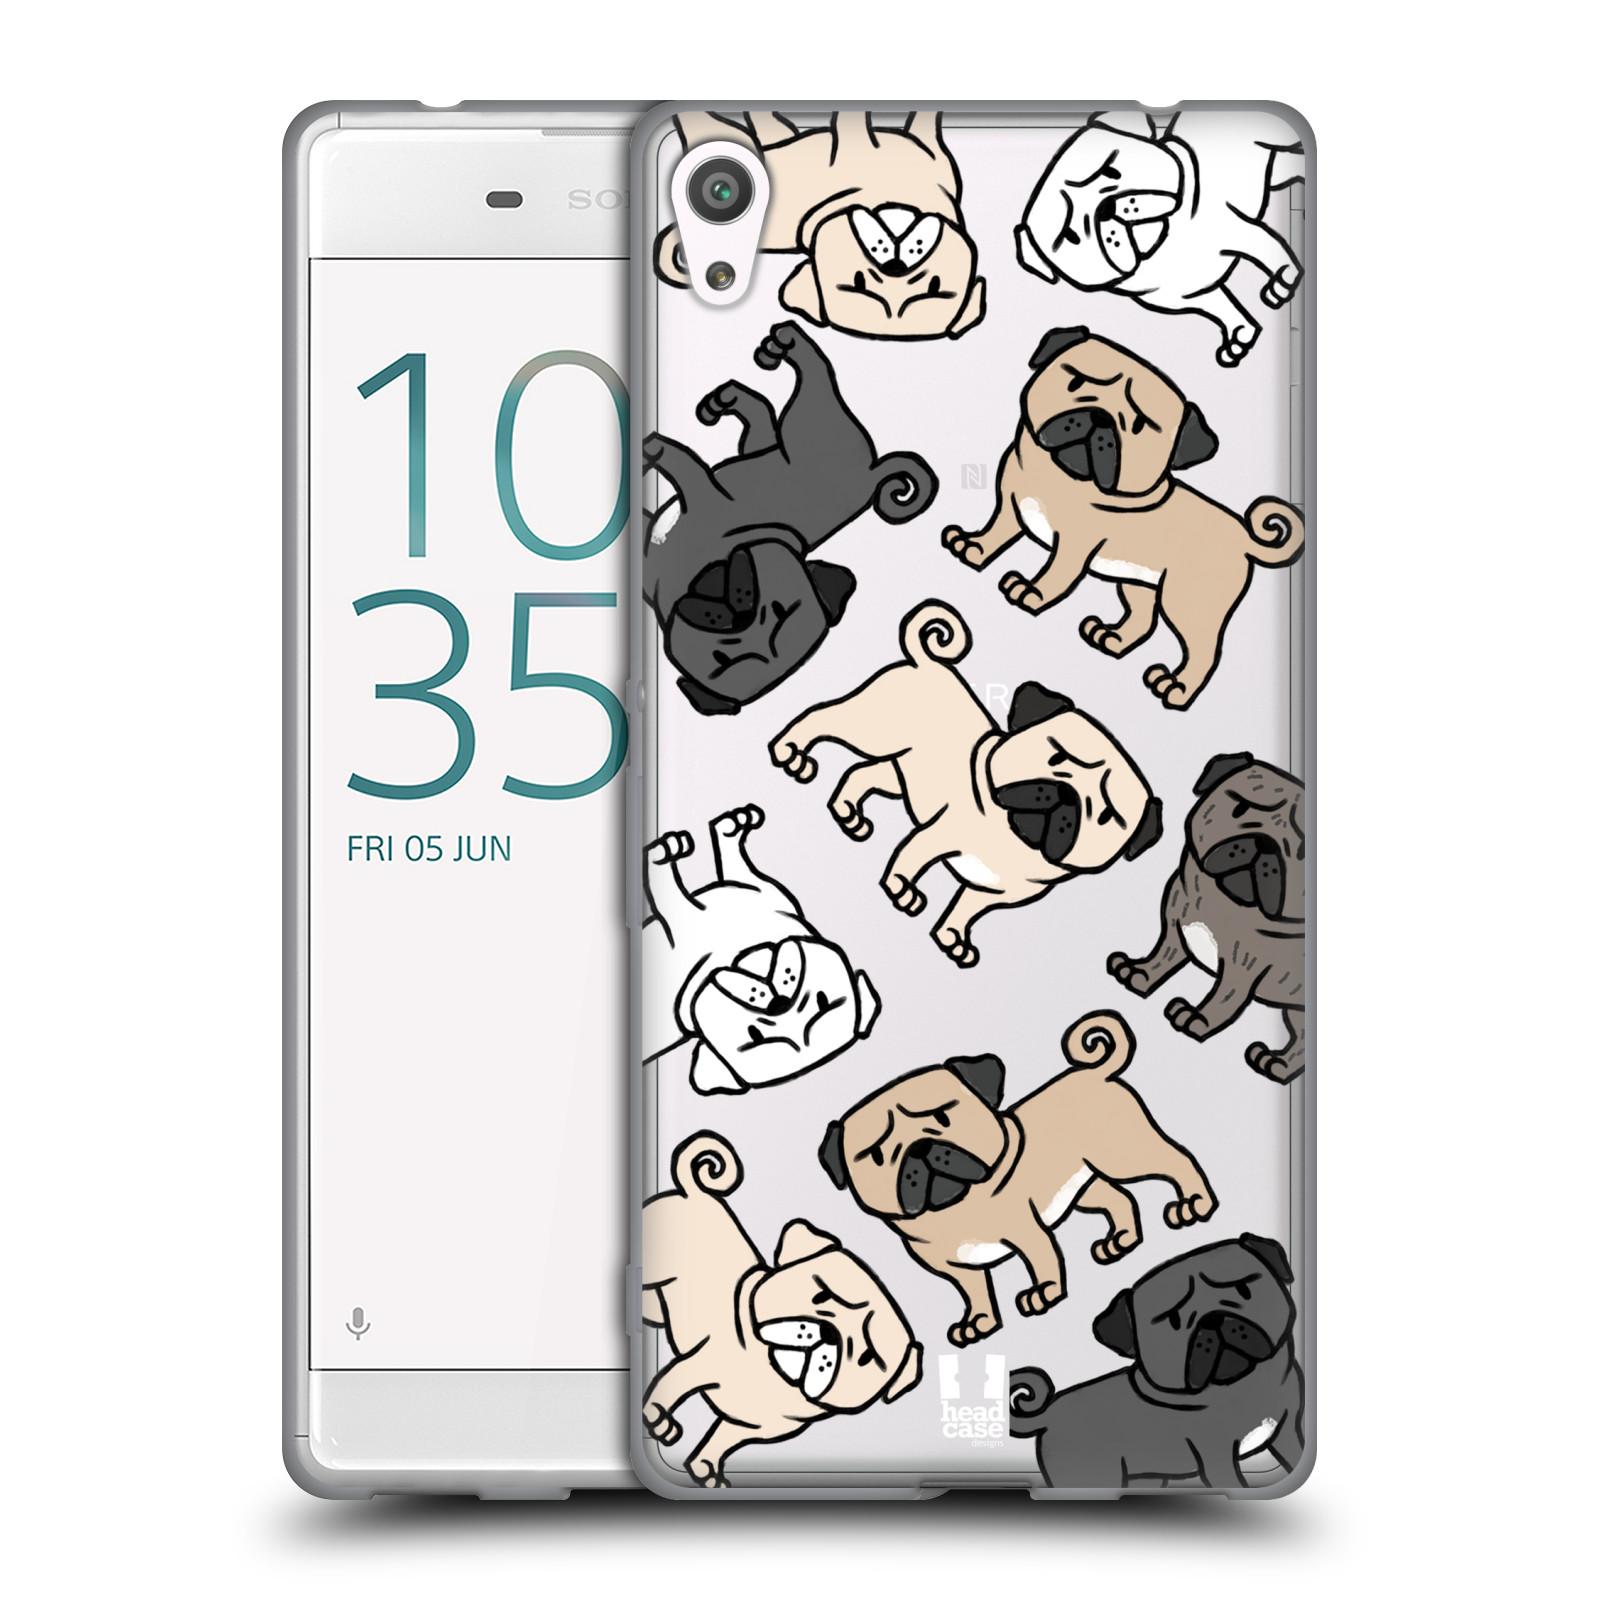 HEAD CASE silikonový obal na mobil Sony Xperia XA ULTRA pejsek Pug Mopsík